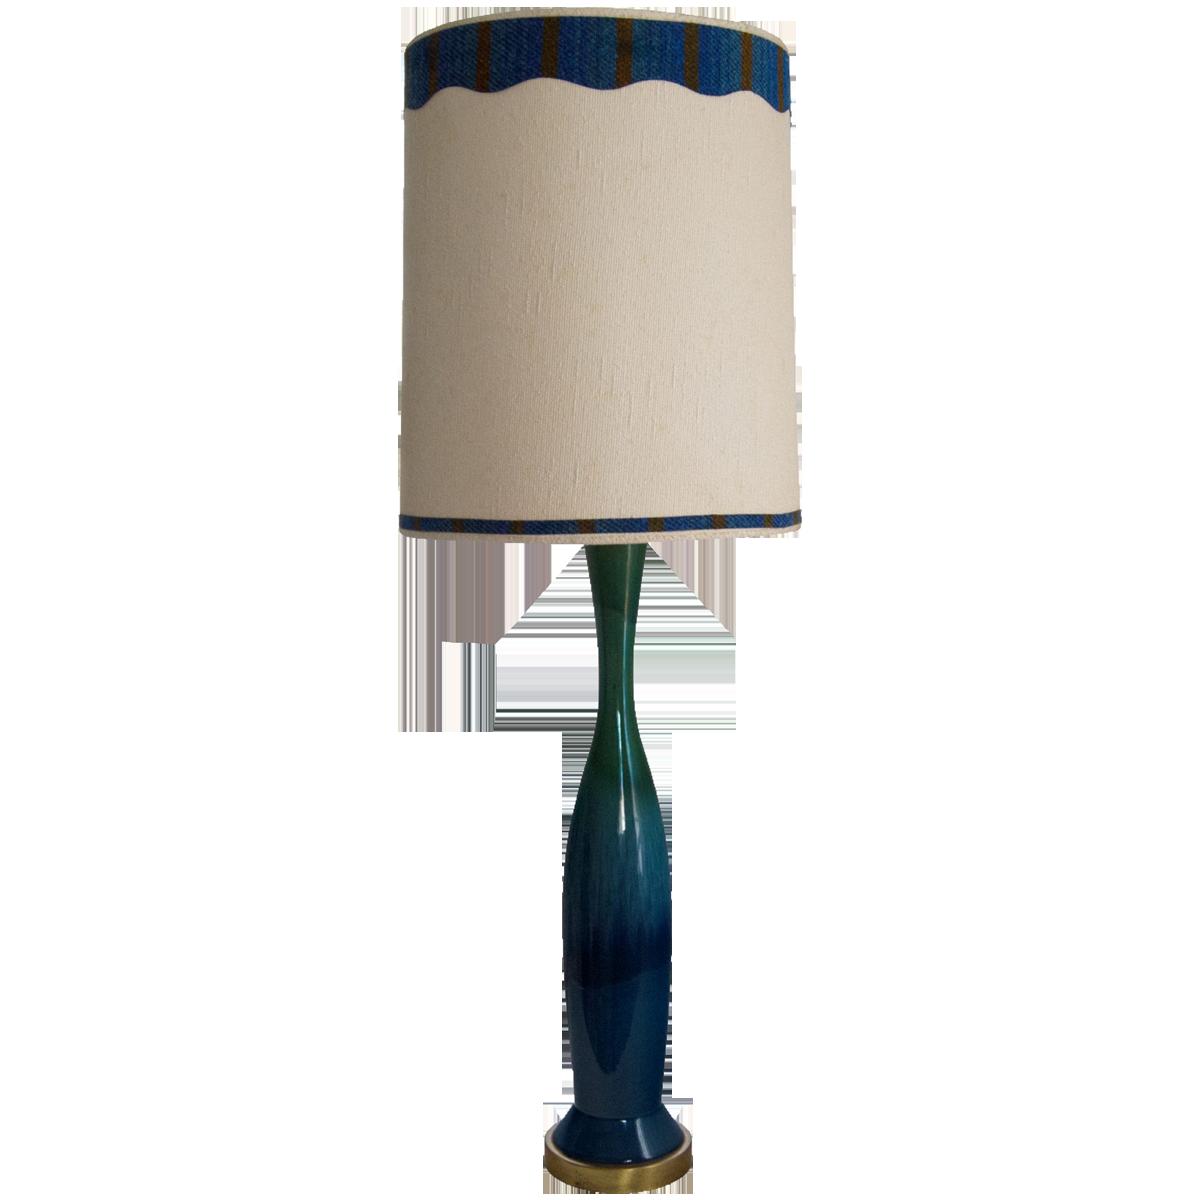 Lamp clipart furniture. Modern table png viyet